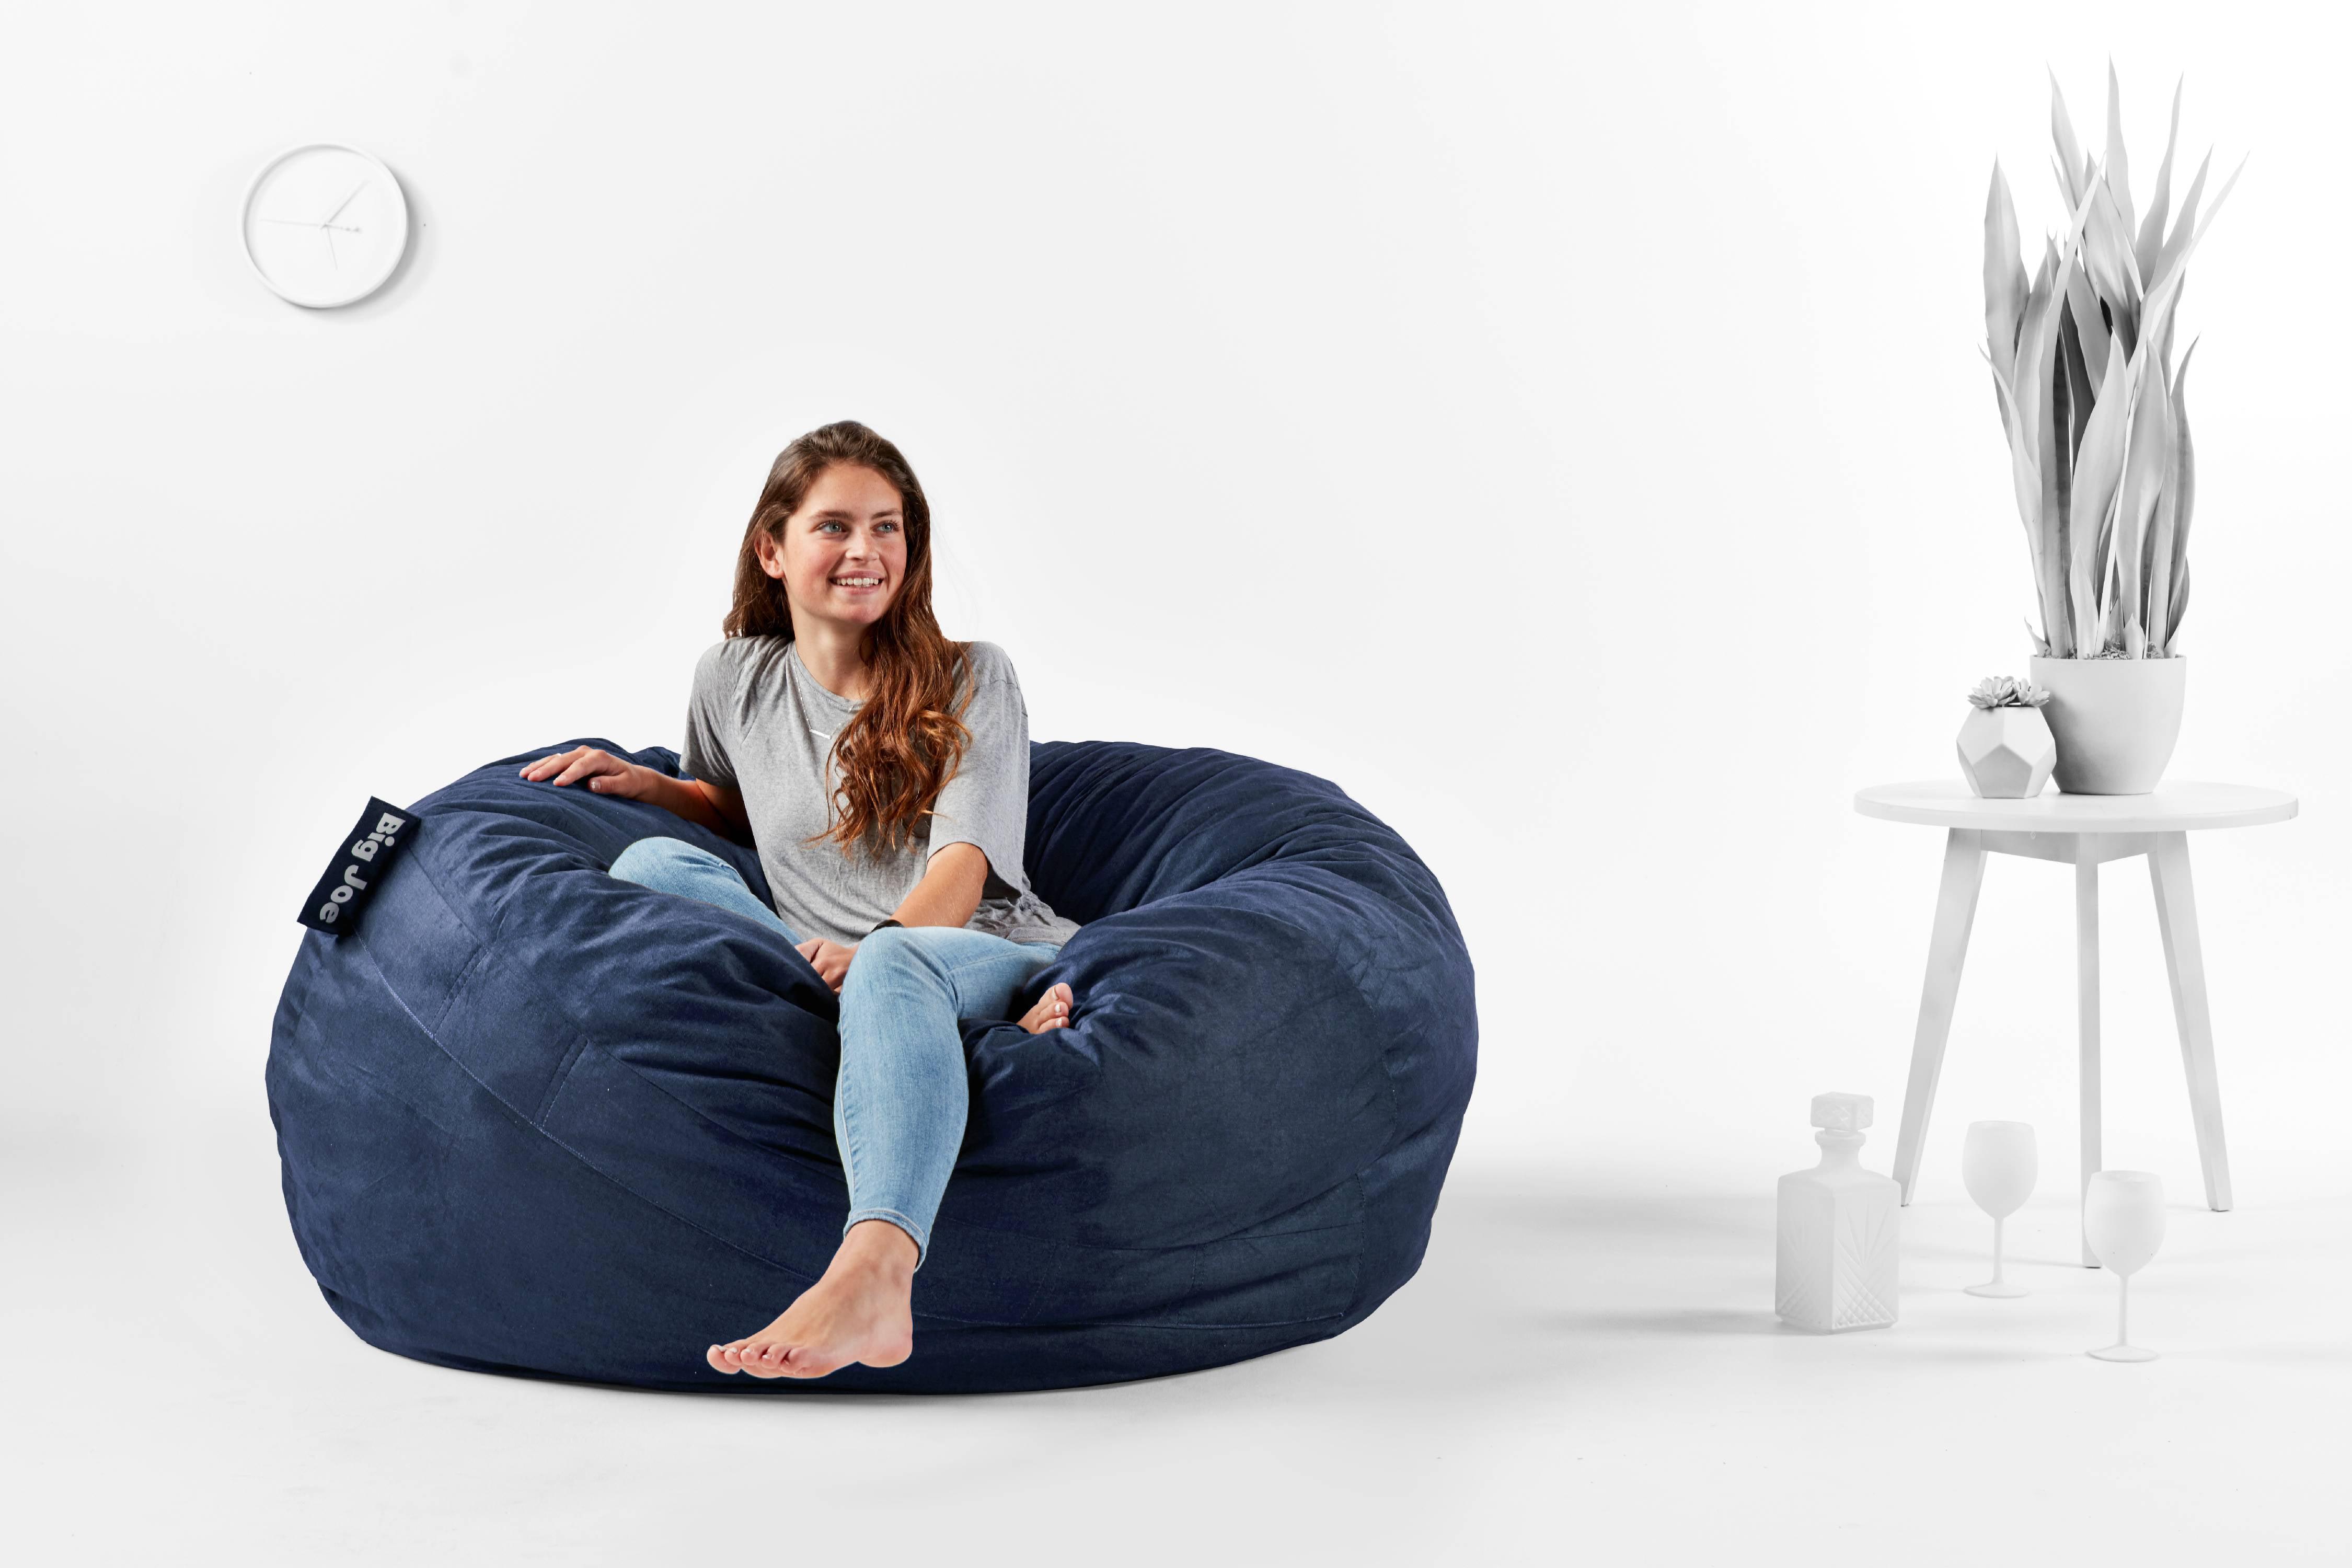 Astonishing Home Large Xxxl Size Black Color Comfort Suede Bean Bag Inzonedesignstudio Interior Chair Design Inzonedesignstudiocom